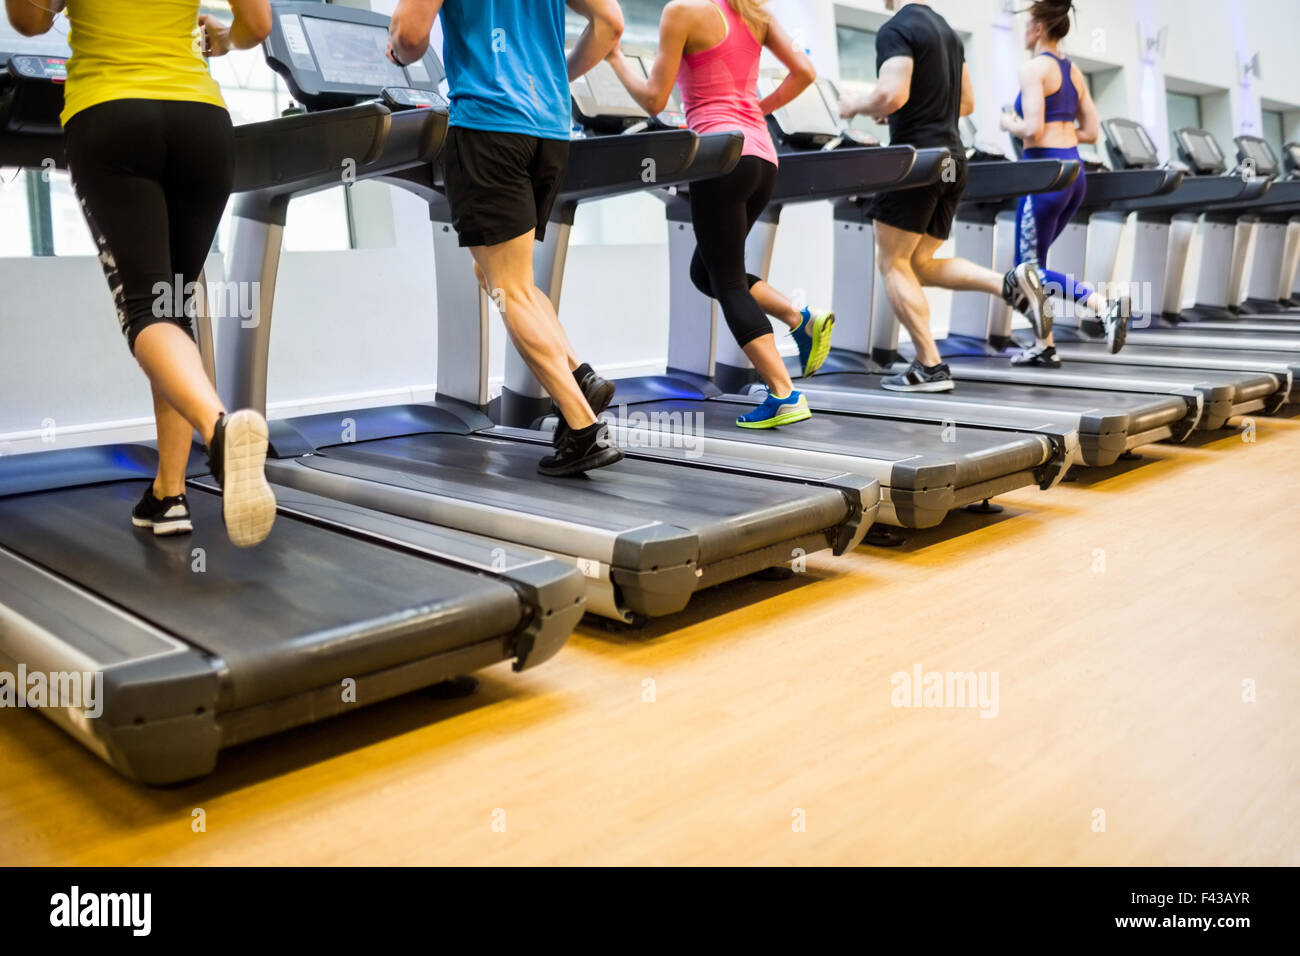 Fit people jogging on treadmills - Stock Image